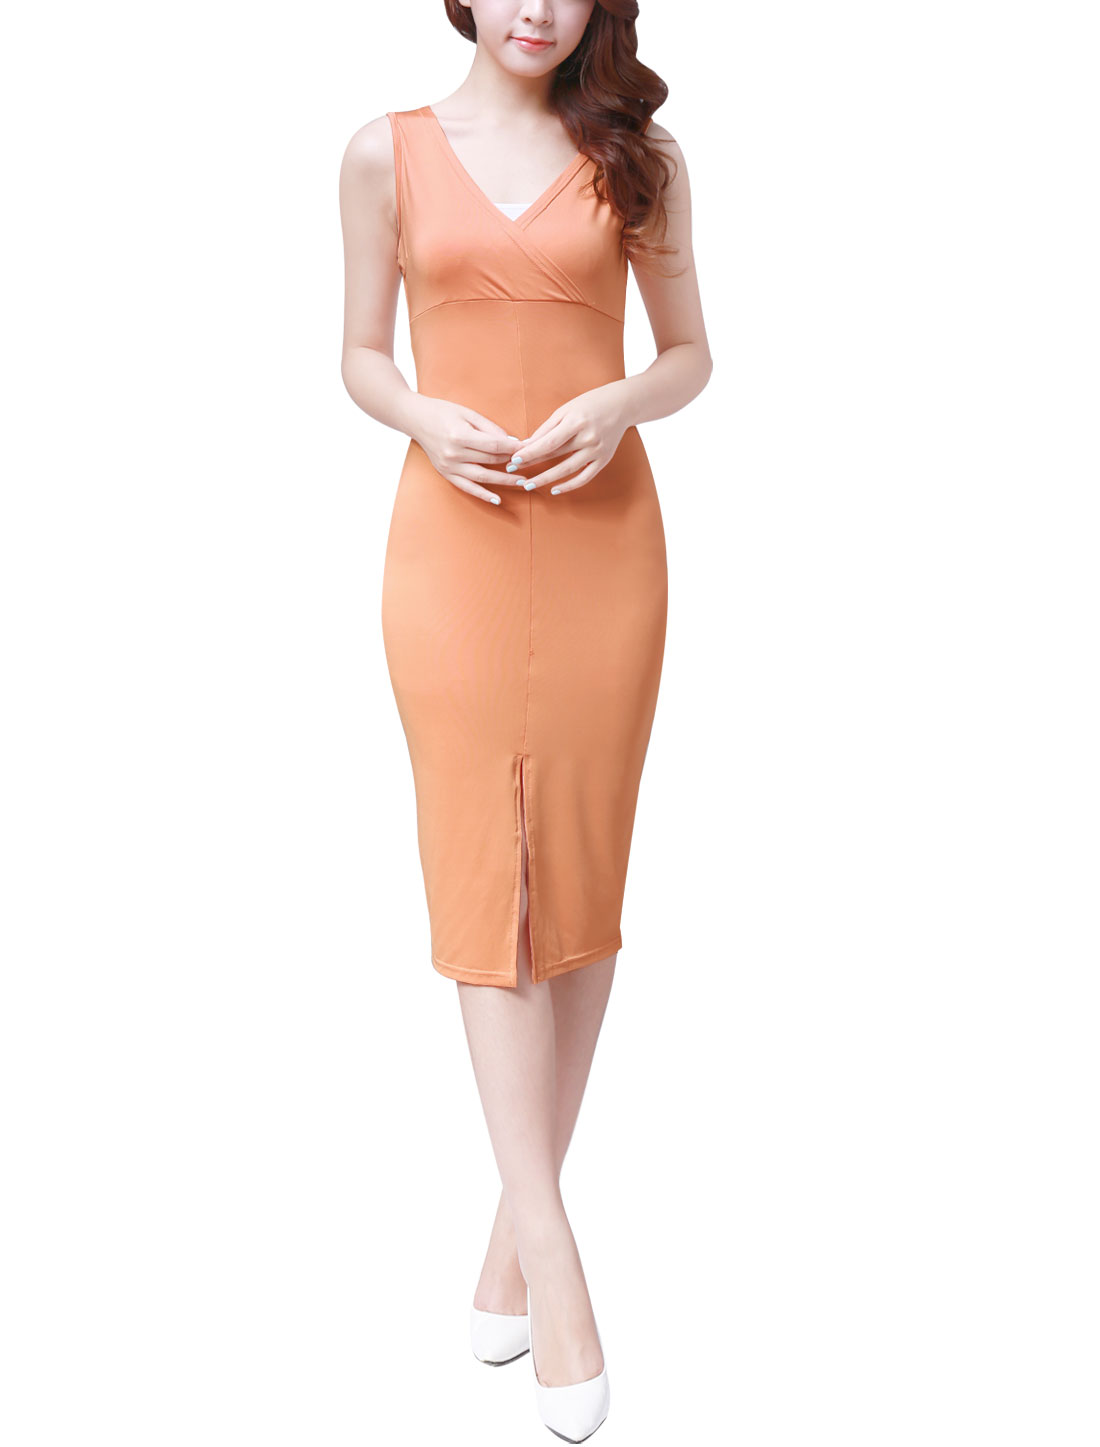 Woman NEW Fashion Pink Color V Neck Sleeveless Knee-Length Dress S